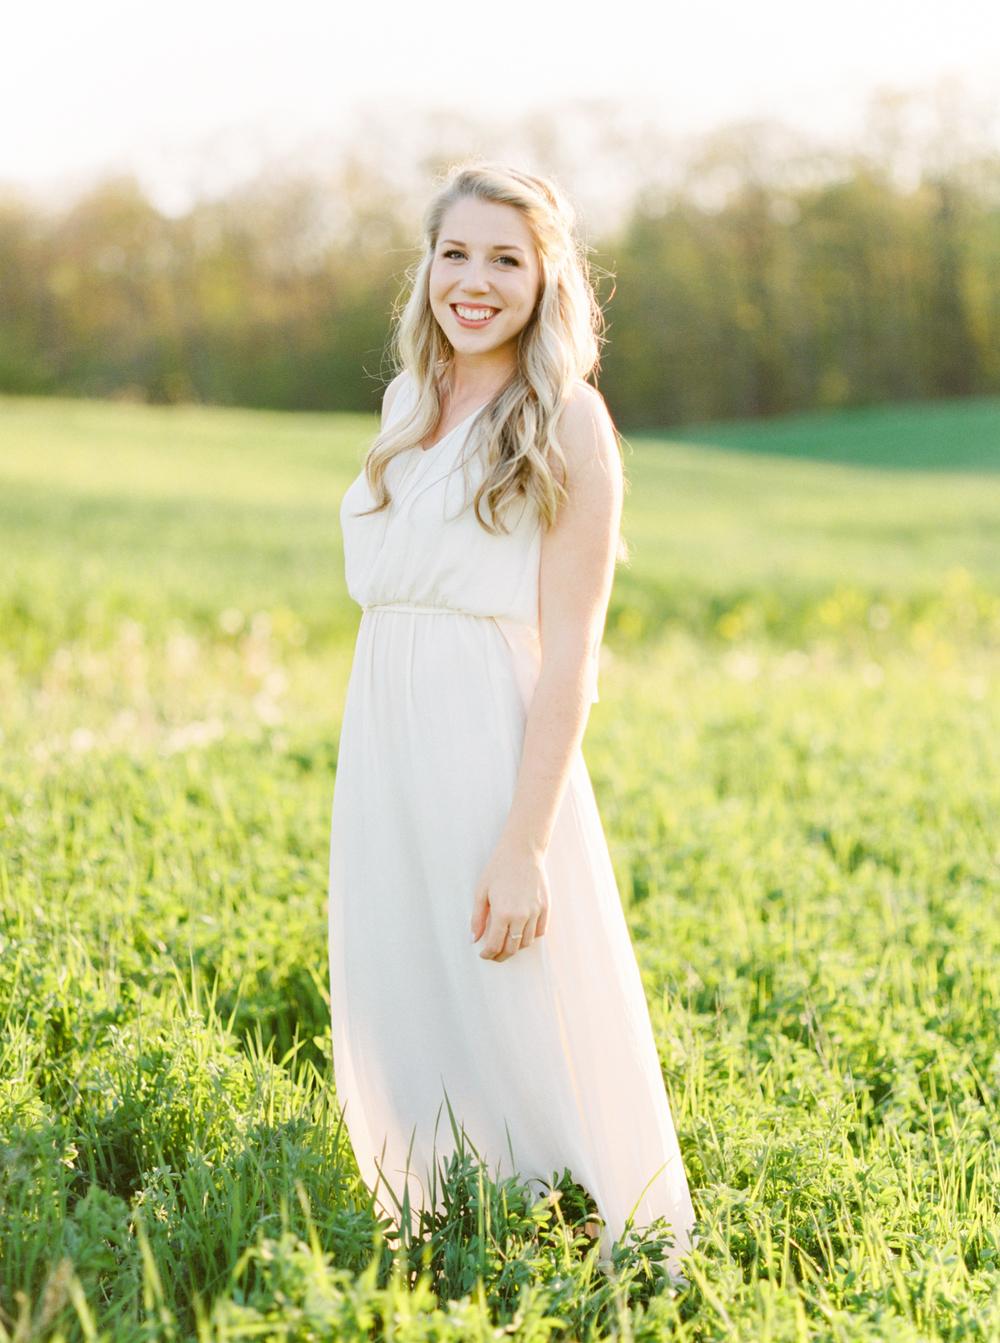 Katie-Nicolle-Niagara-Toronto-Muskoka-Wedding-4.jpg